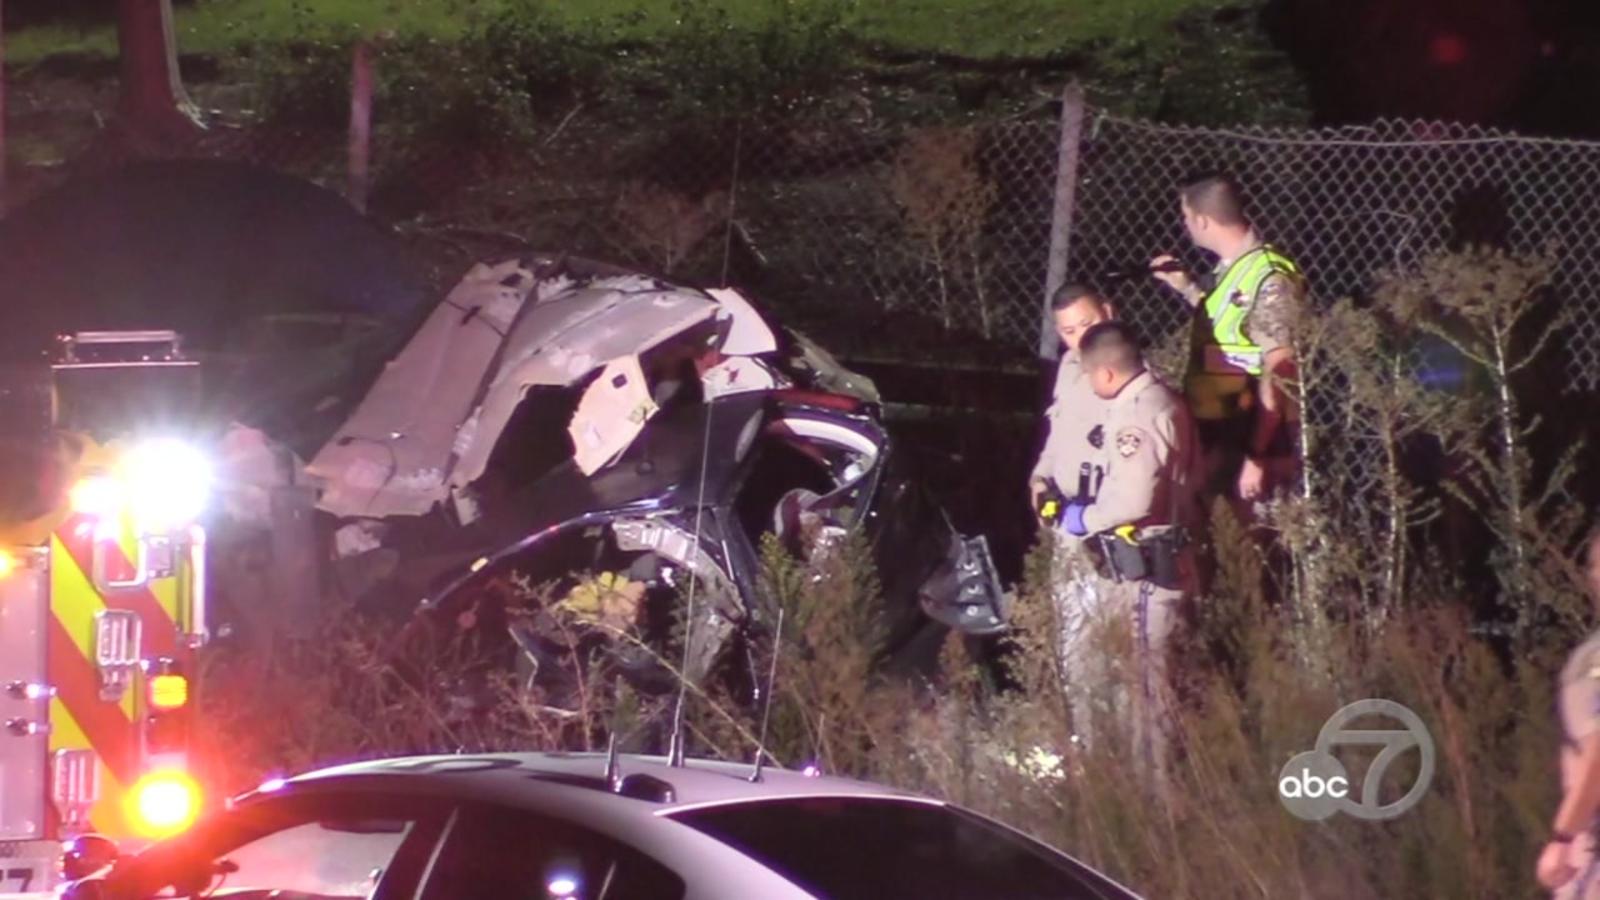 1 killed in crash on southbound Hwy 101 in Menlo Park